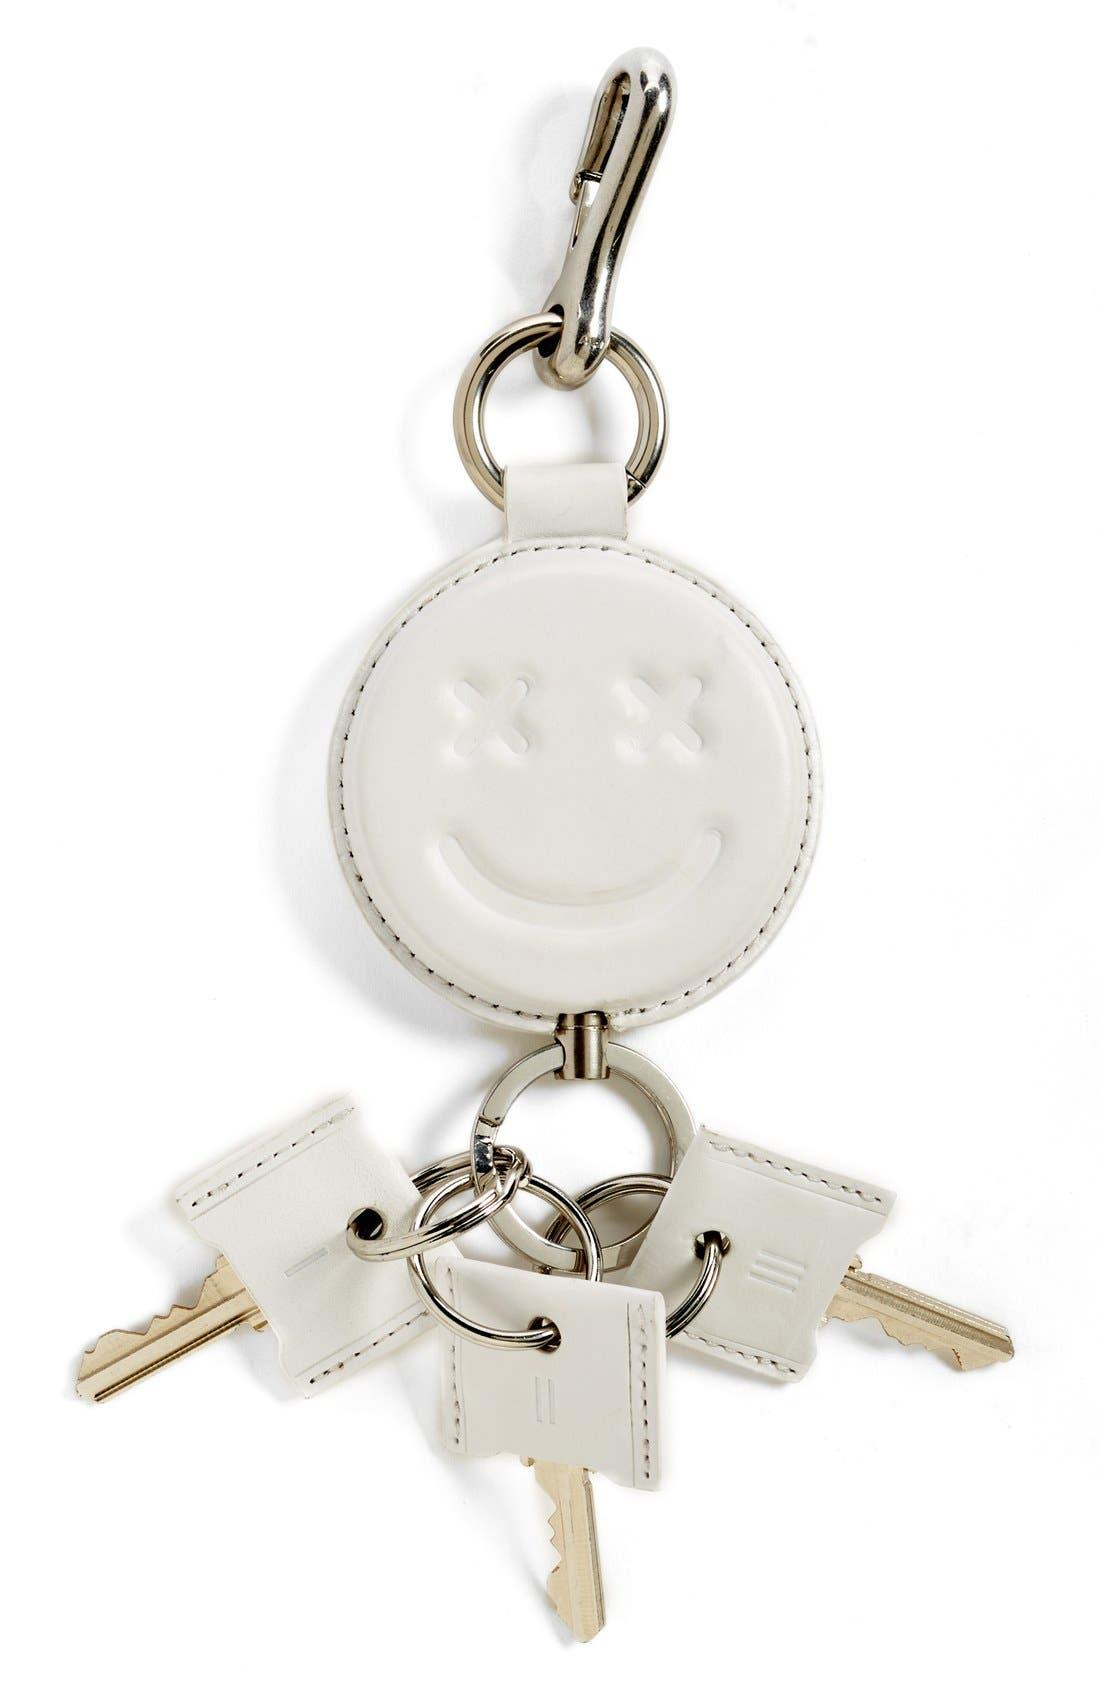 Alternate Image 1 Selected - Alexander Wang 'Smiley' Key Ring Bag Charm